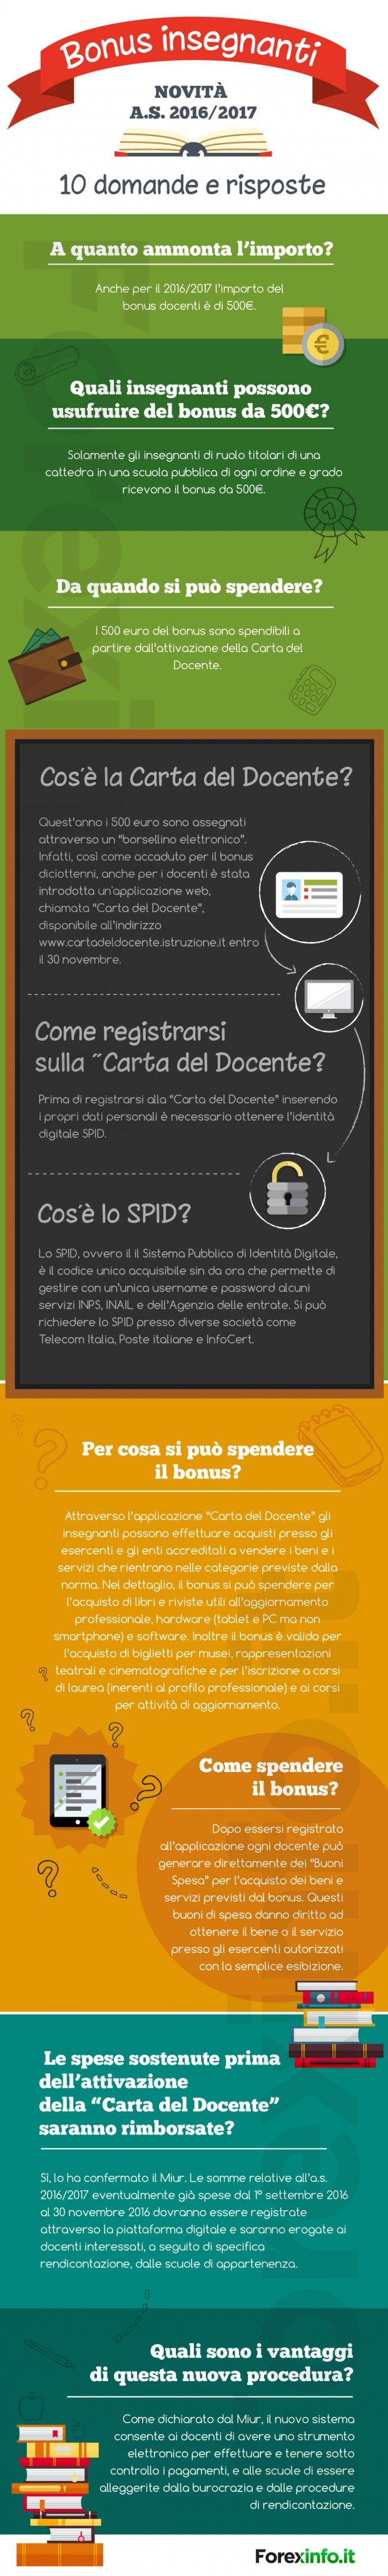 infografica-bonus-docenti-op-58b43